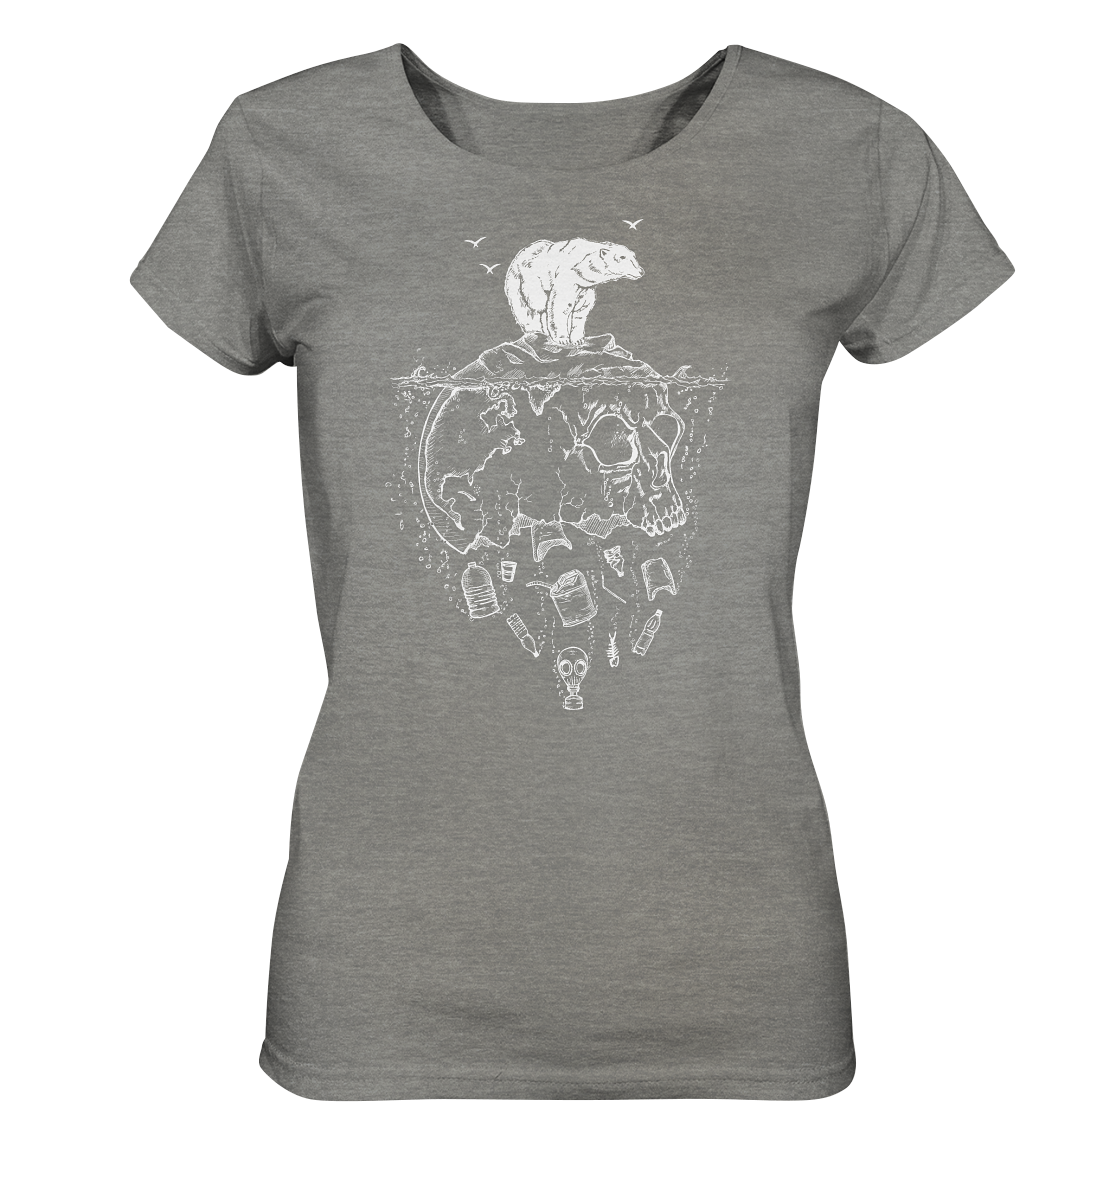 front-ladies-organic-shirt-meliert-818381-1116x-5.png